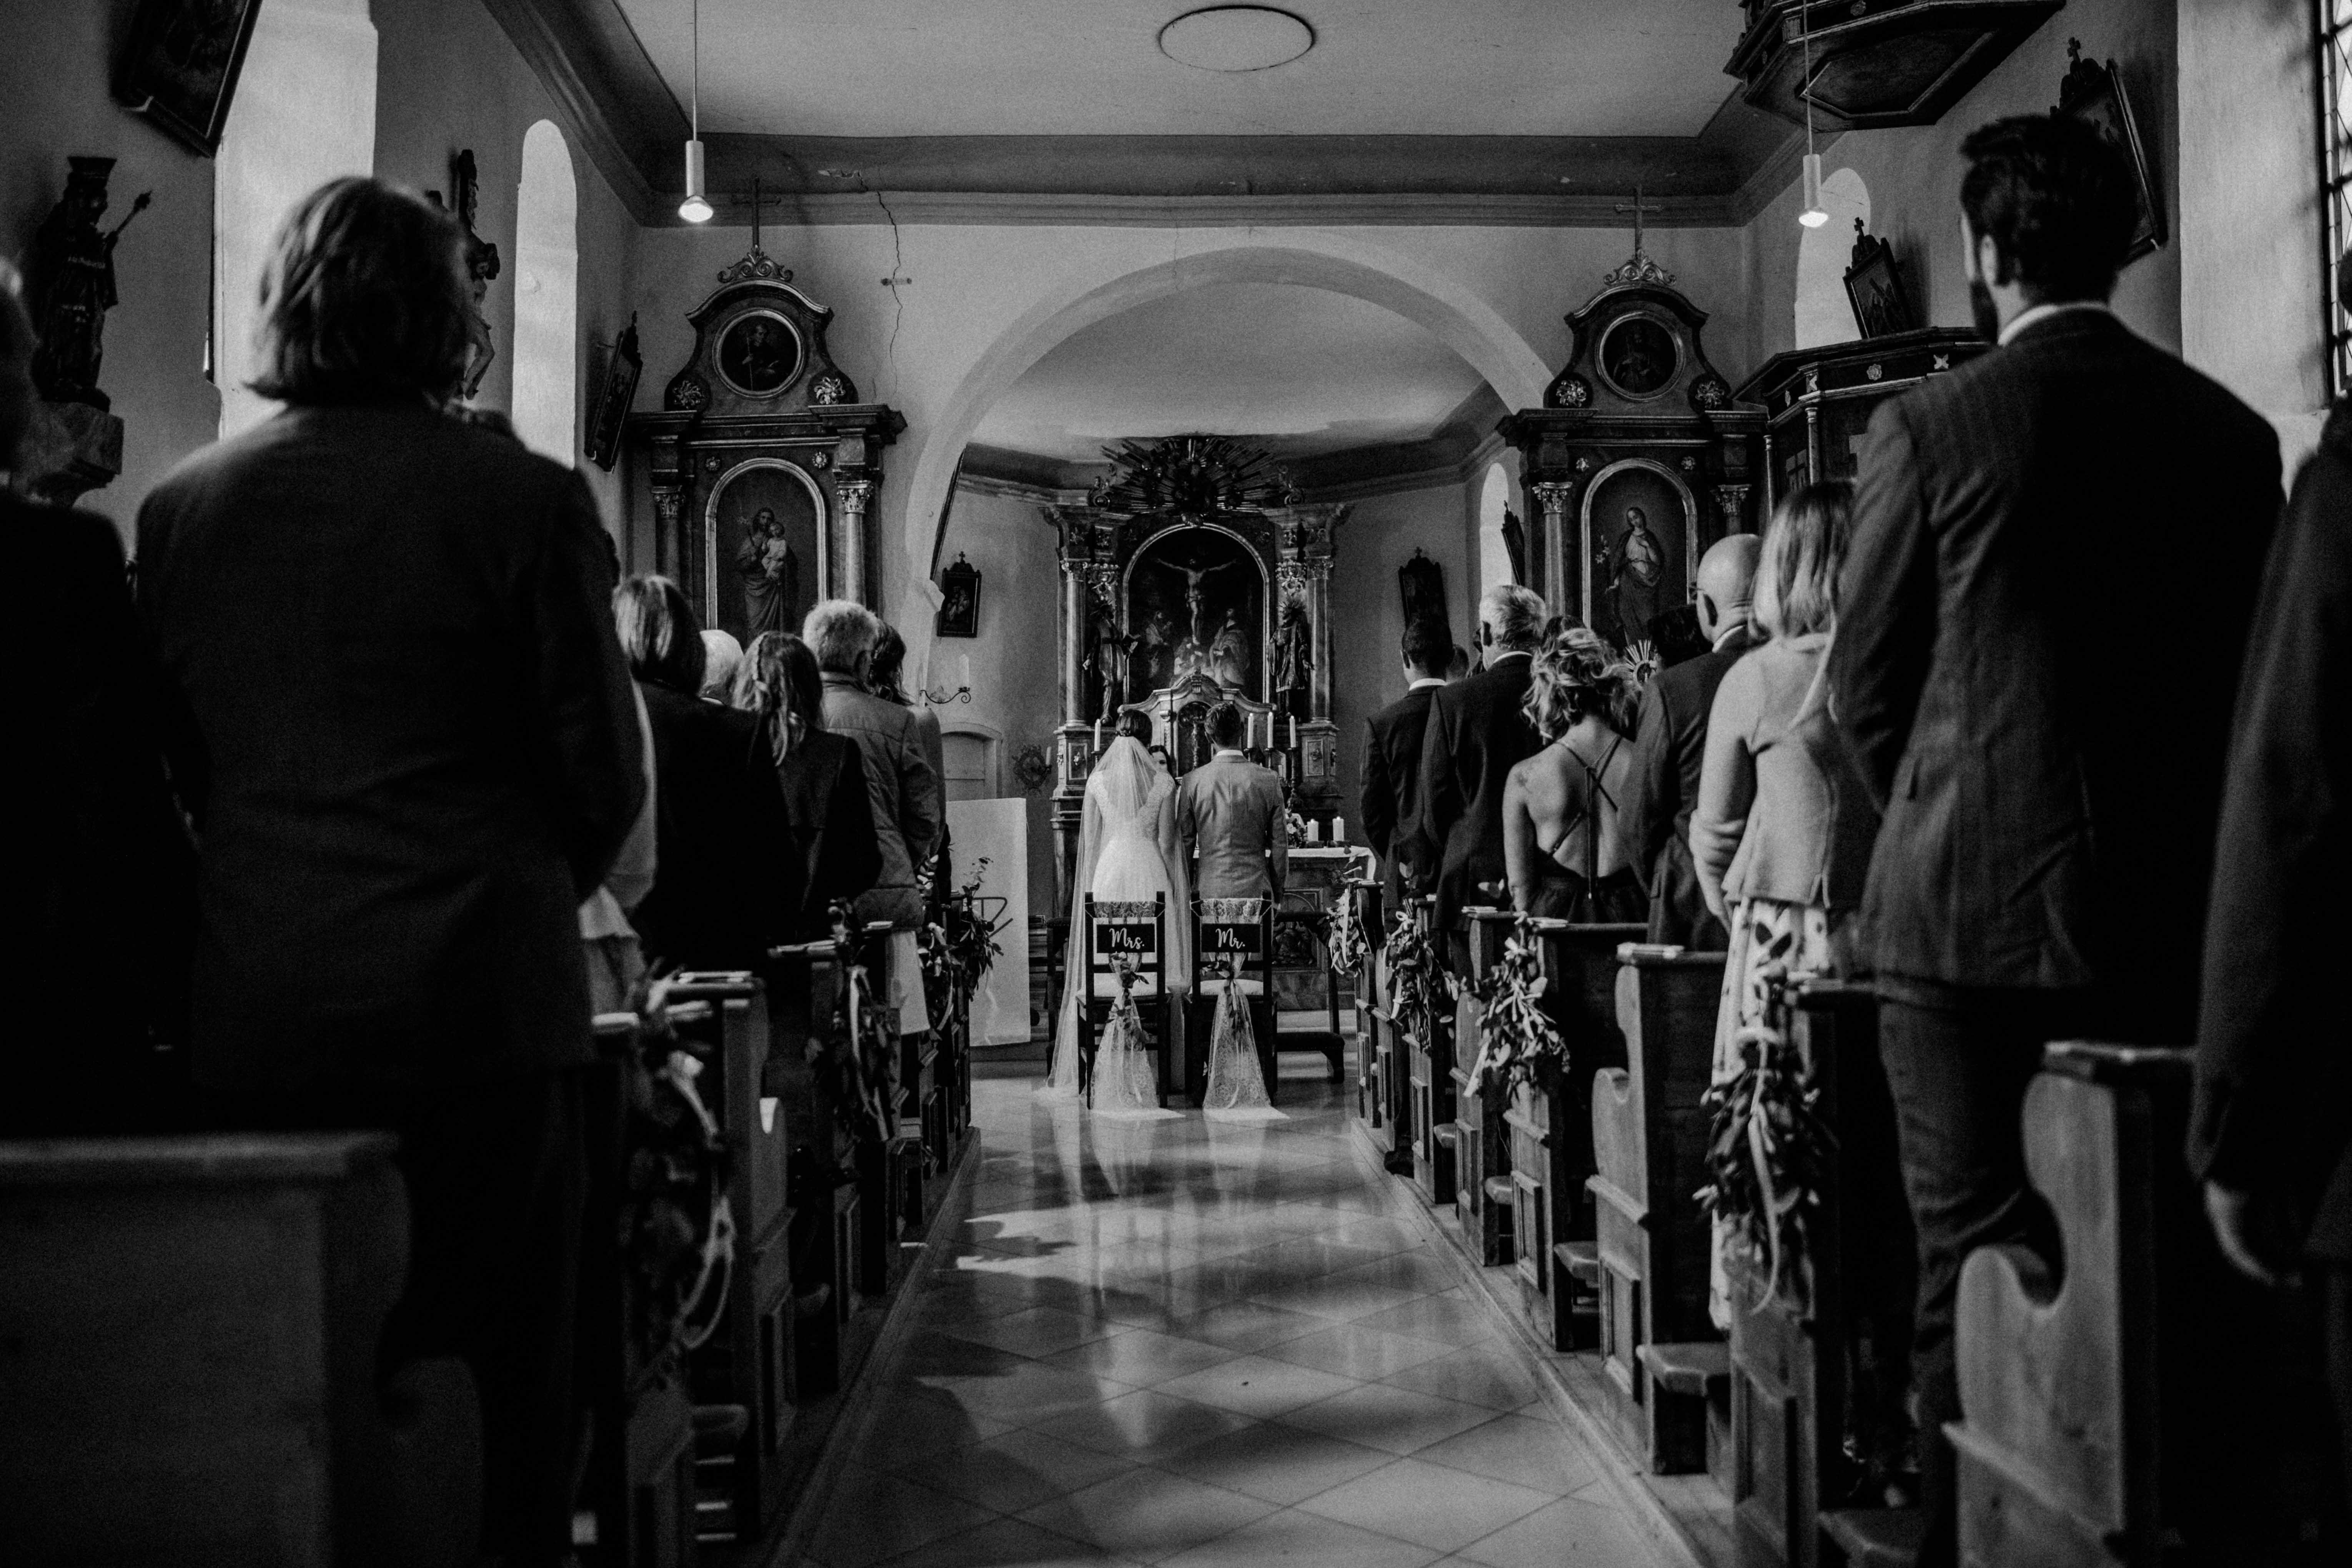 altar bänke sonja poehlmann photography couples muenchen bayern